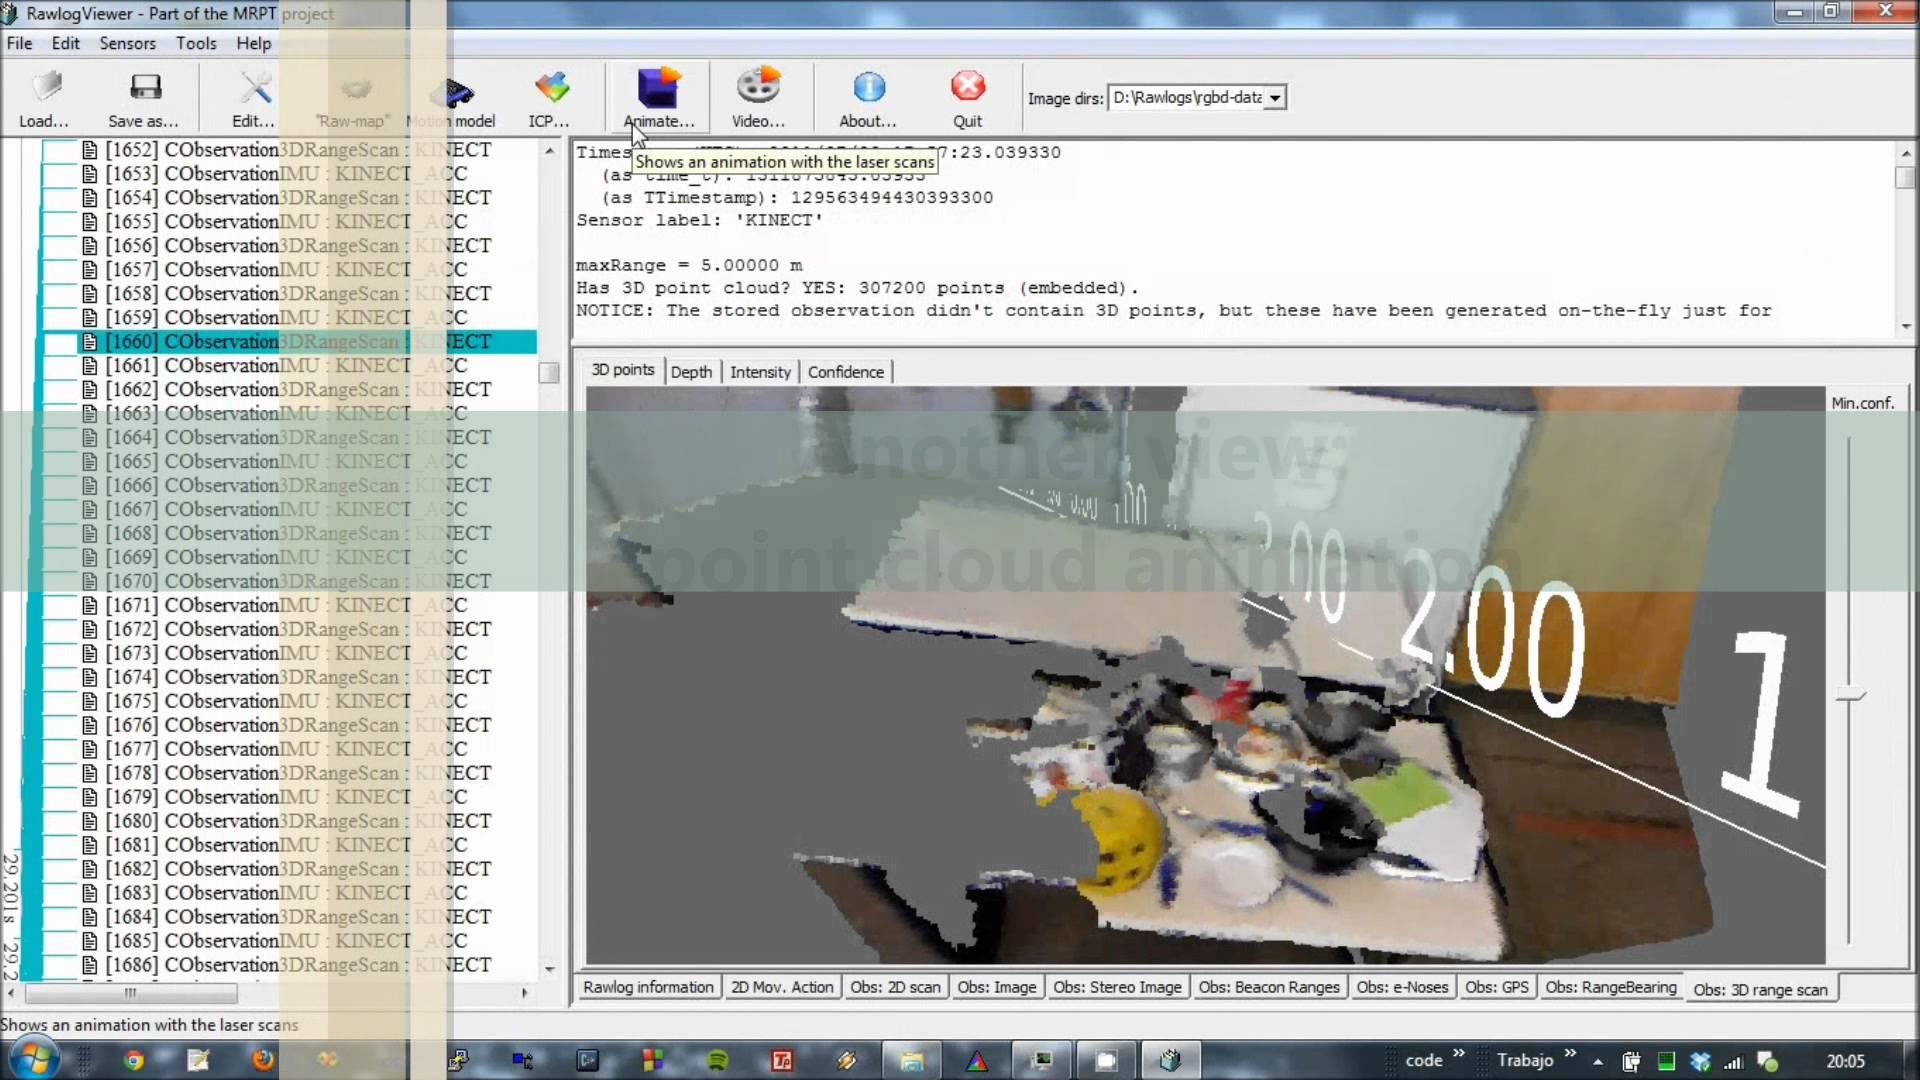 Application: RawLogViewer